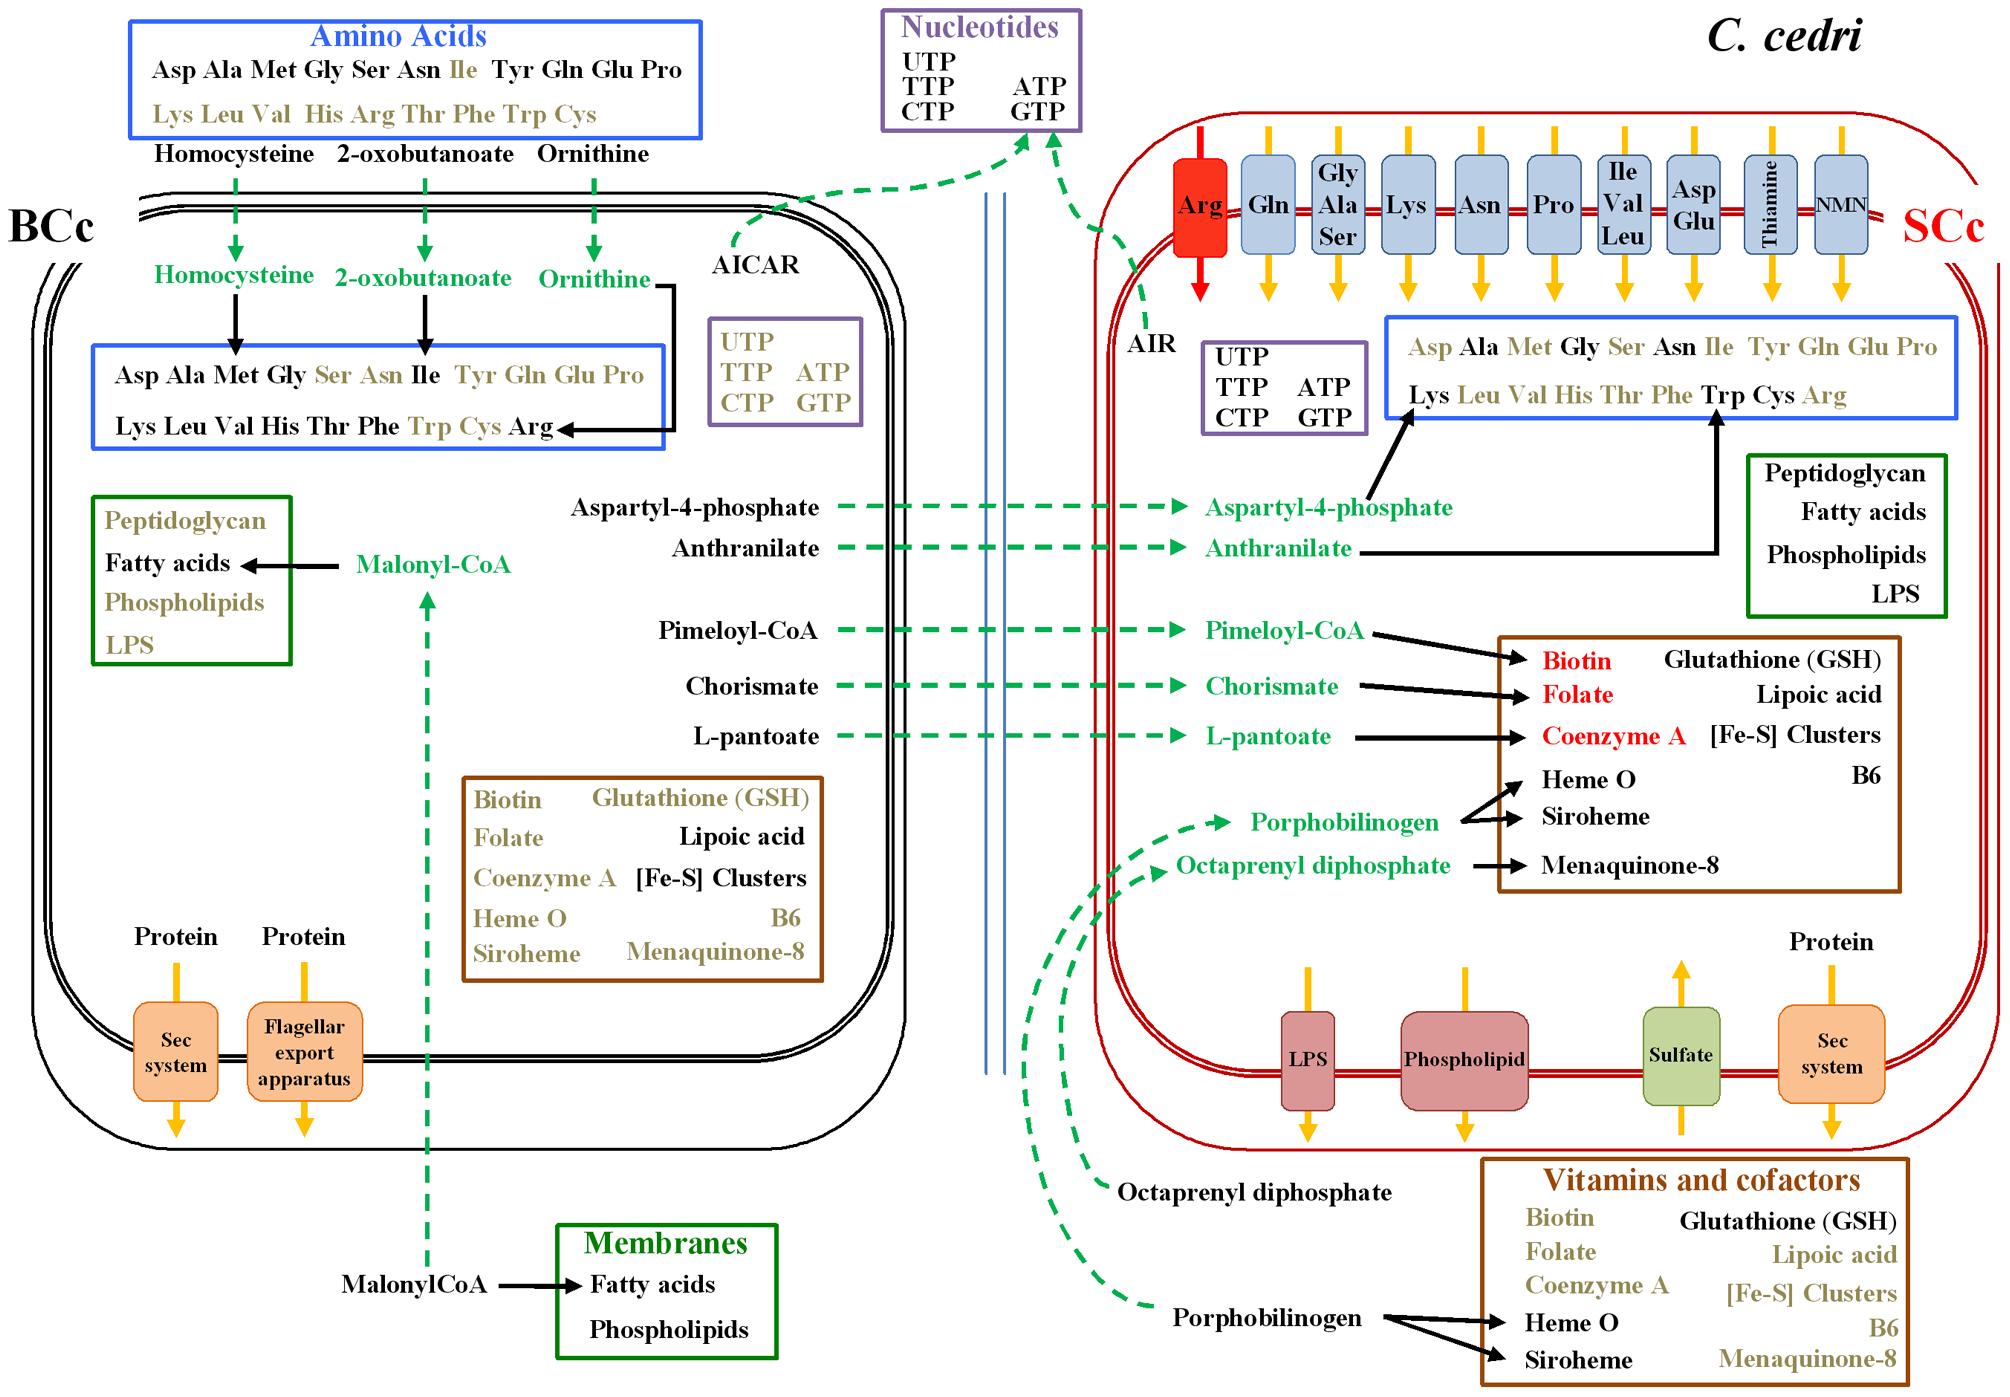 Inferred metabolism of amino acids, nucleotides, membrane compounds, cofactors, and vitamins of the <i>C. cedri</i>-consortium.